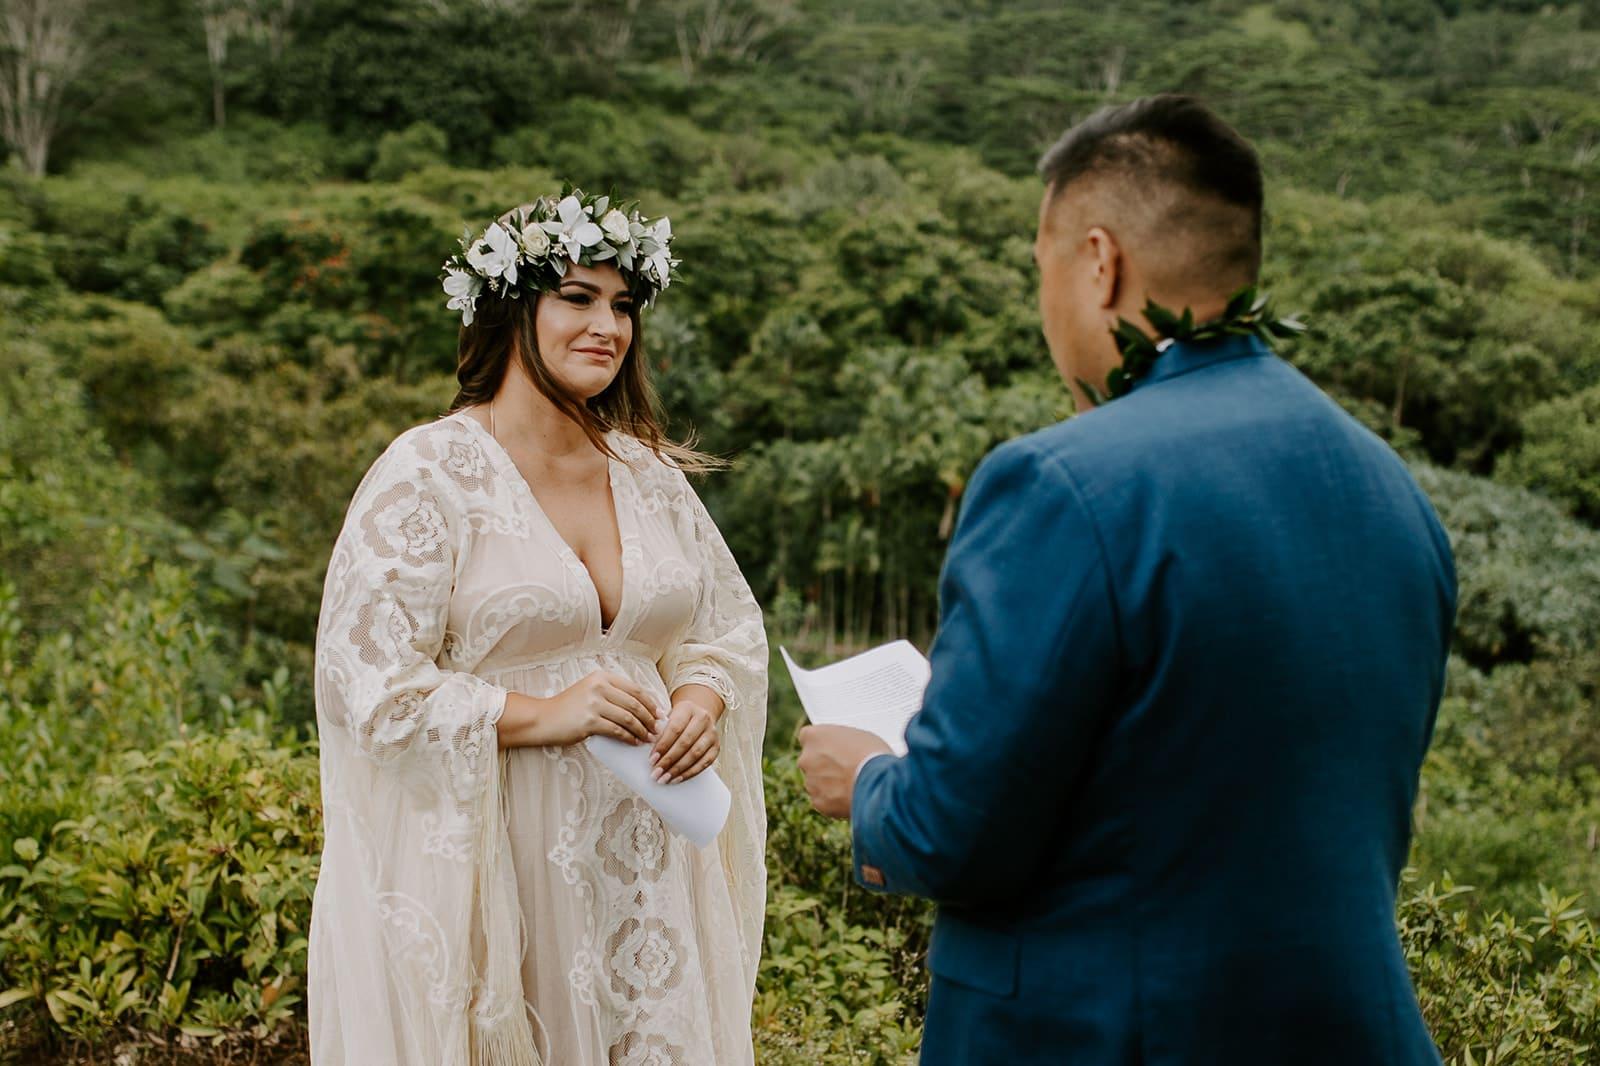 couple getting married in oahu